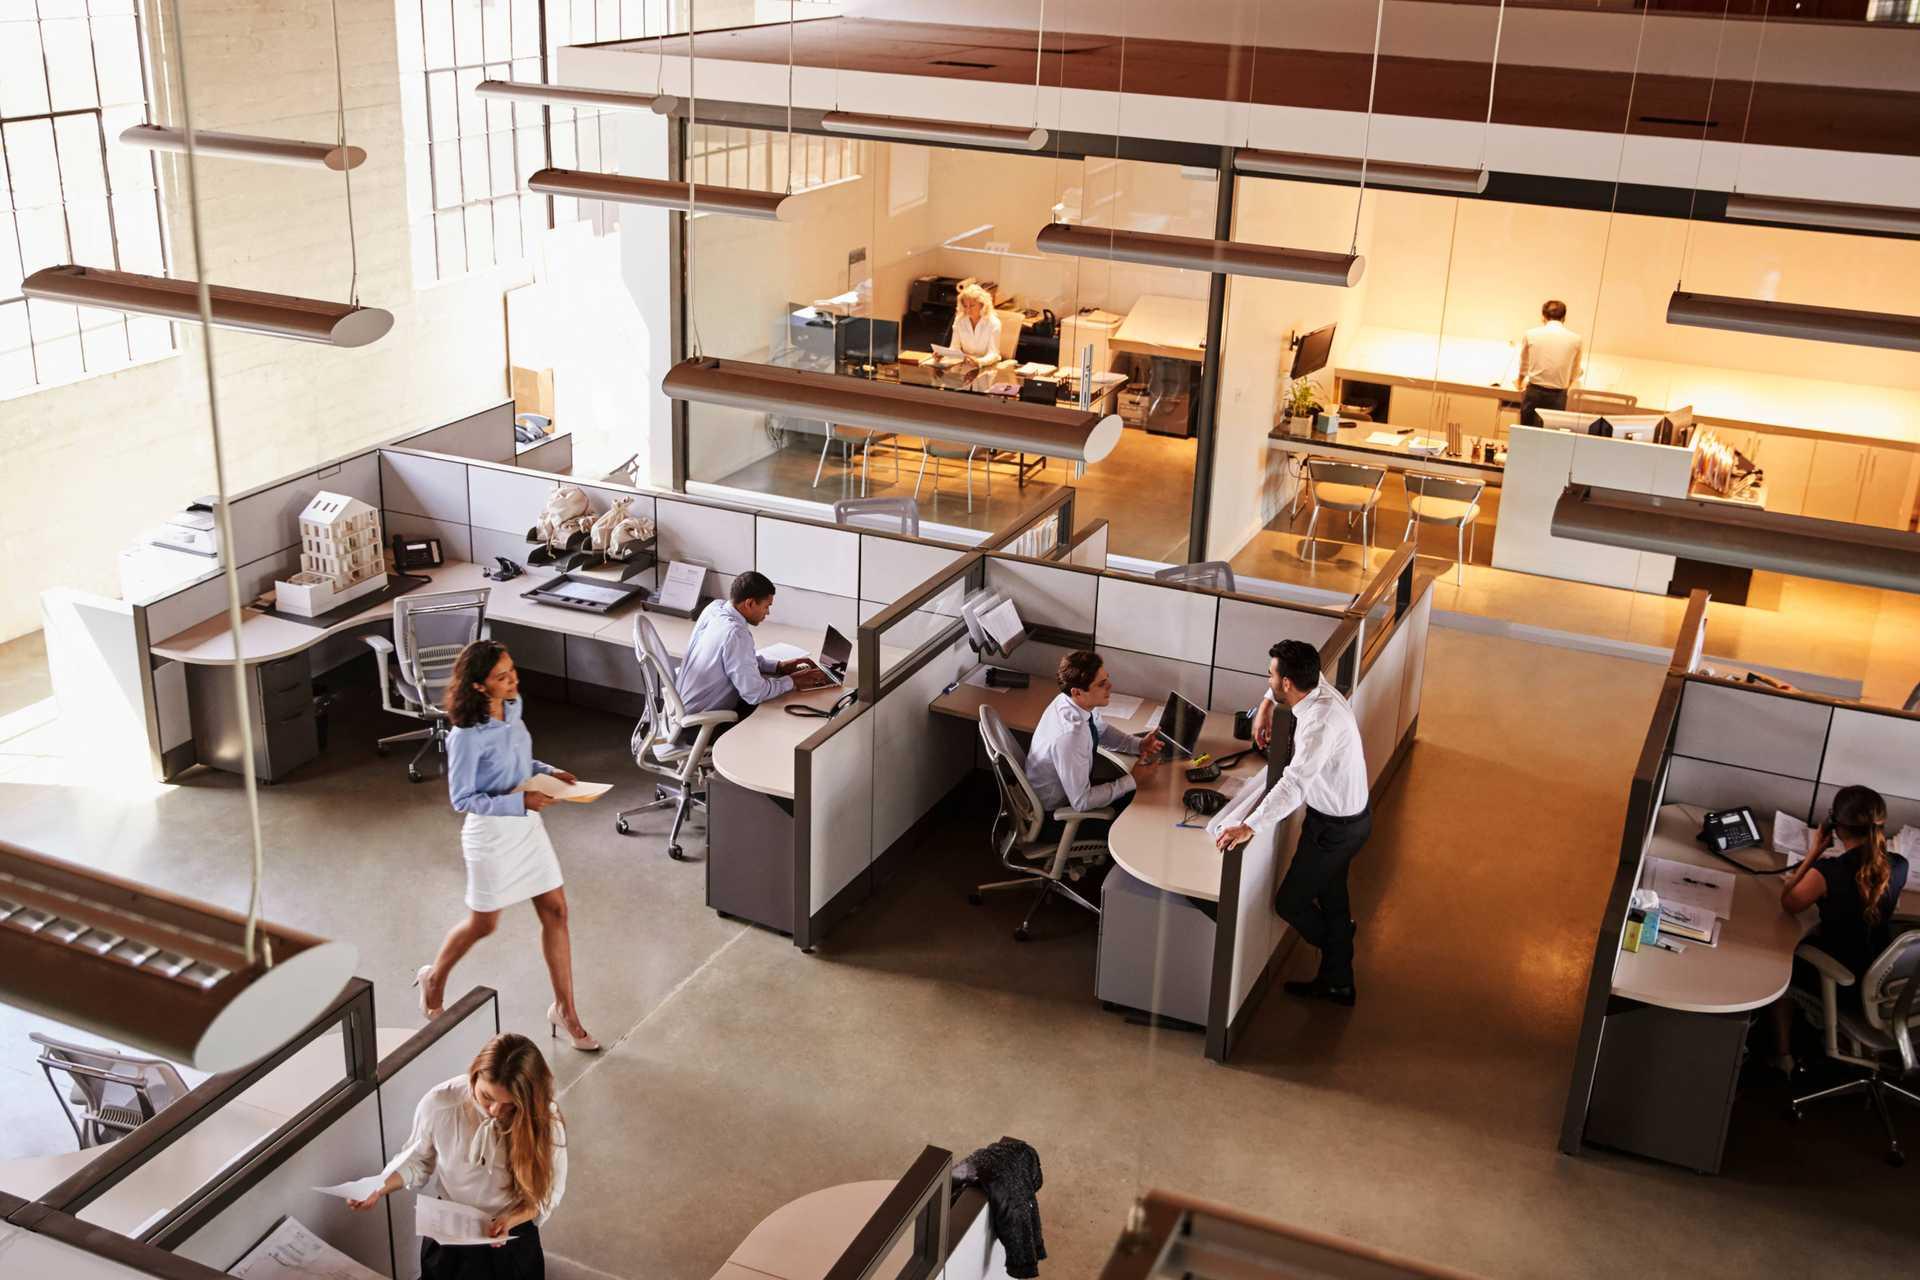 Accruent - Solutions - Hoteling Workspace Management - Hero